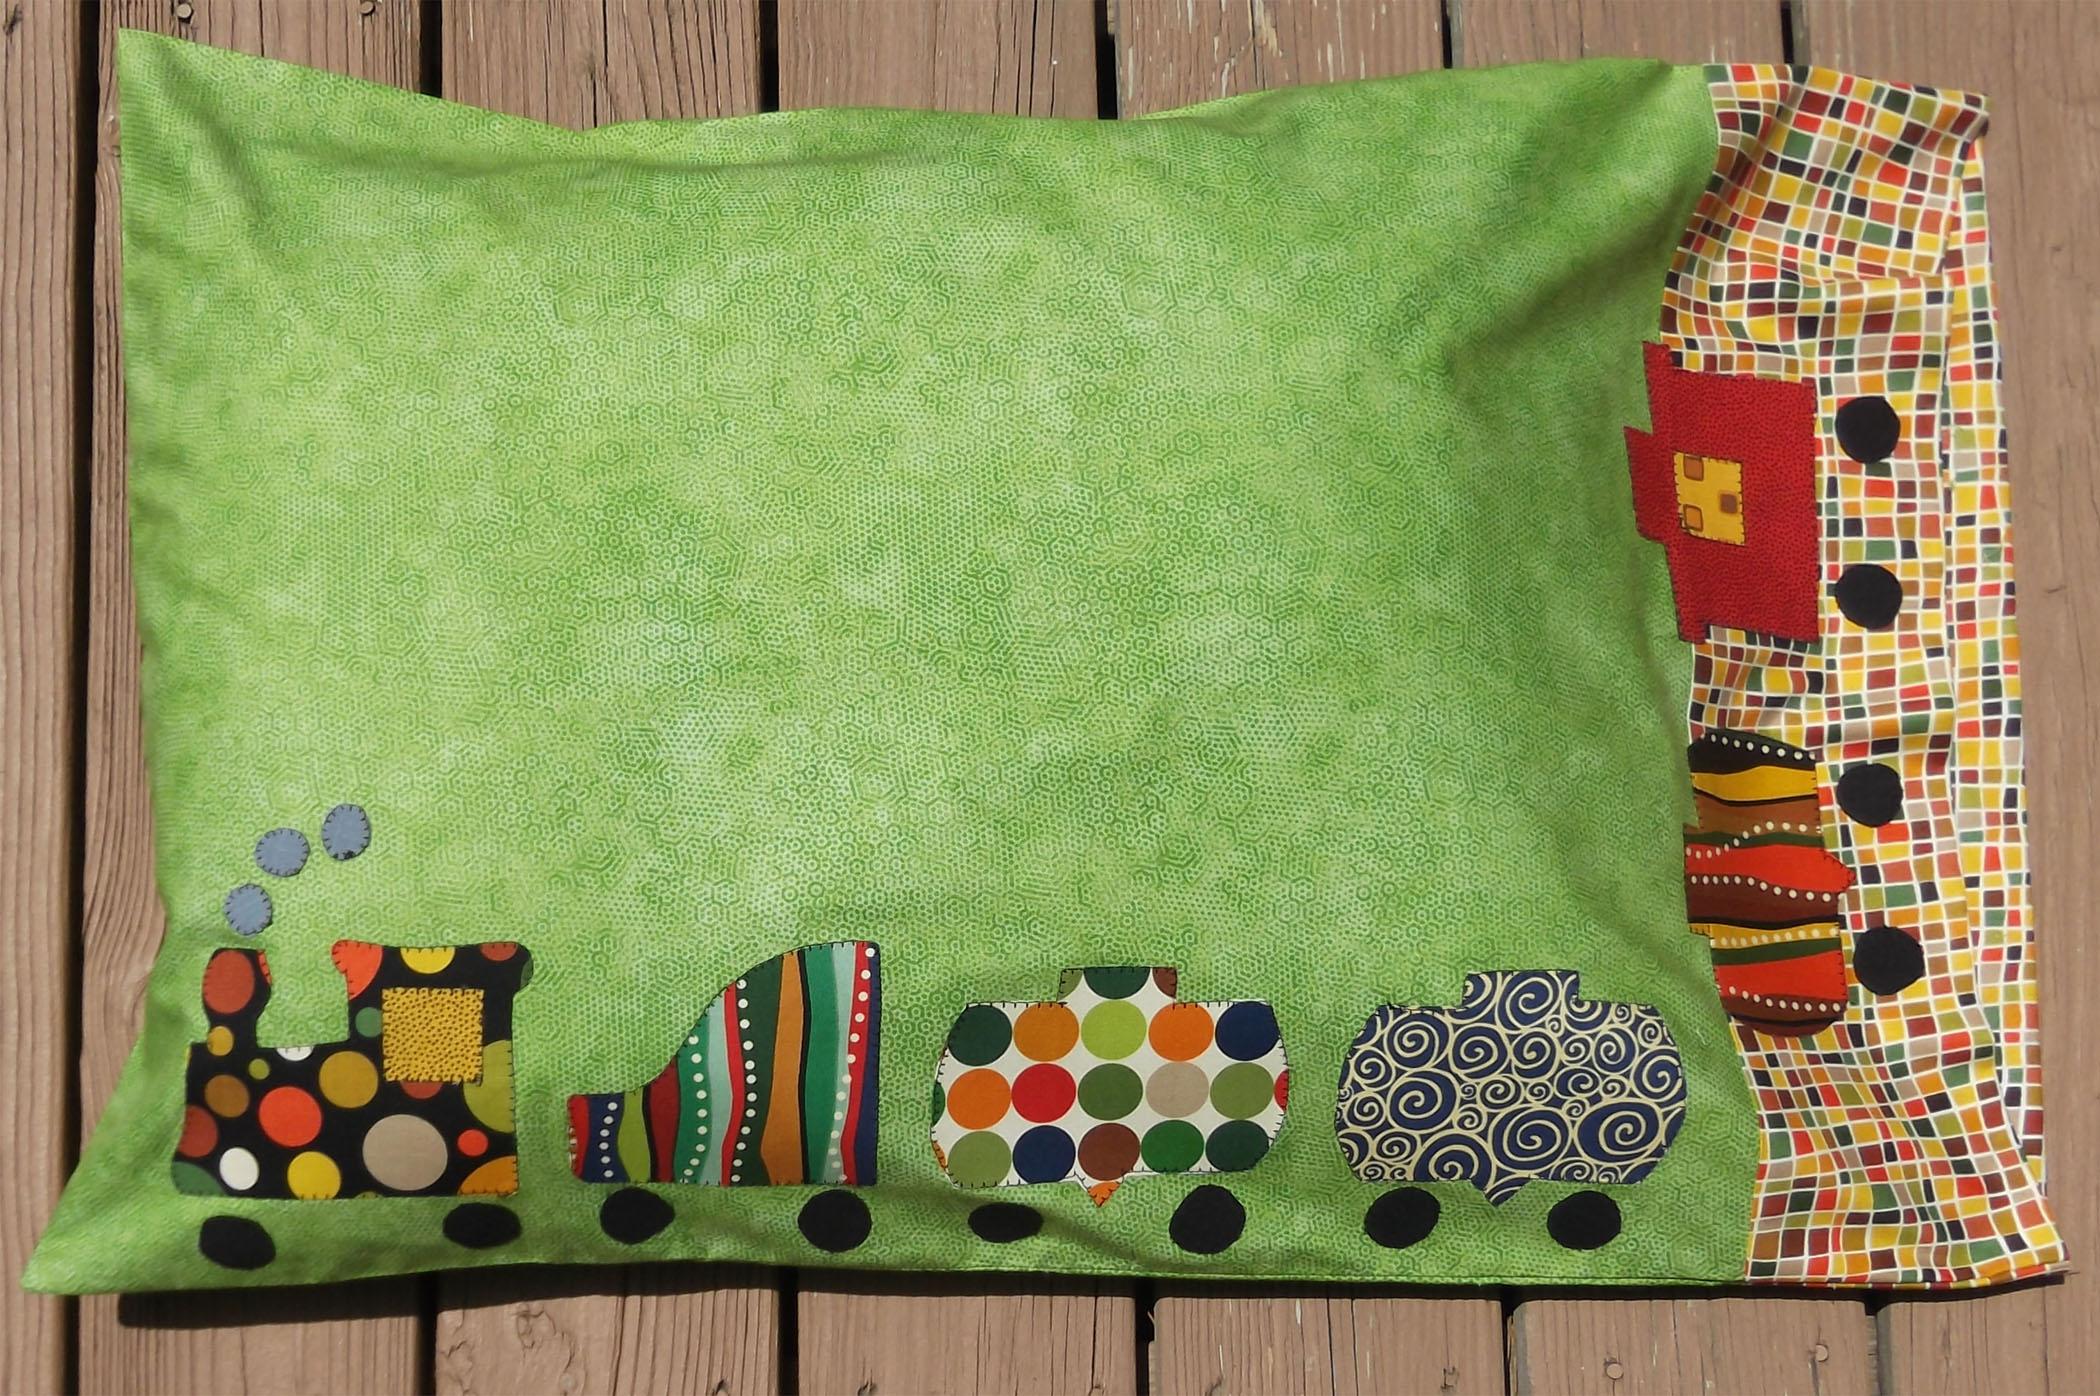 Andover Fabrics' Pillowcase